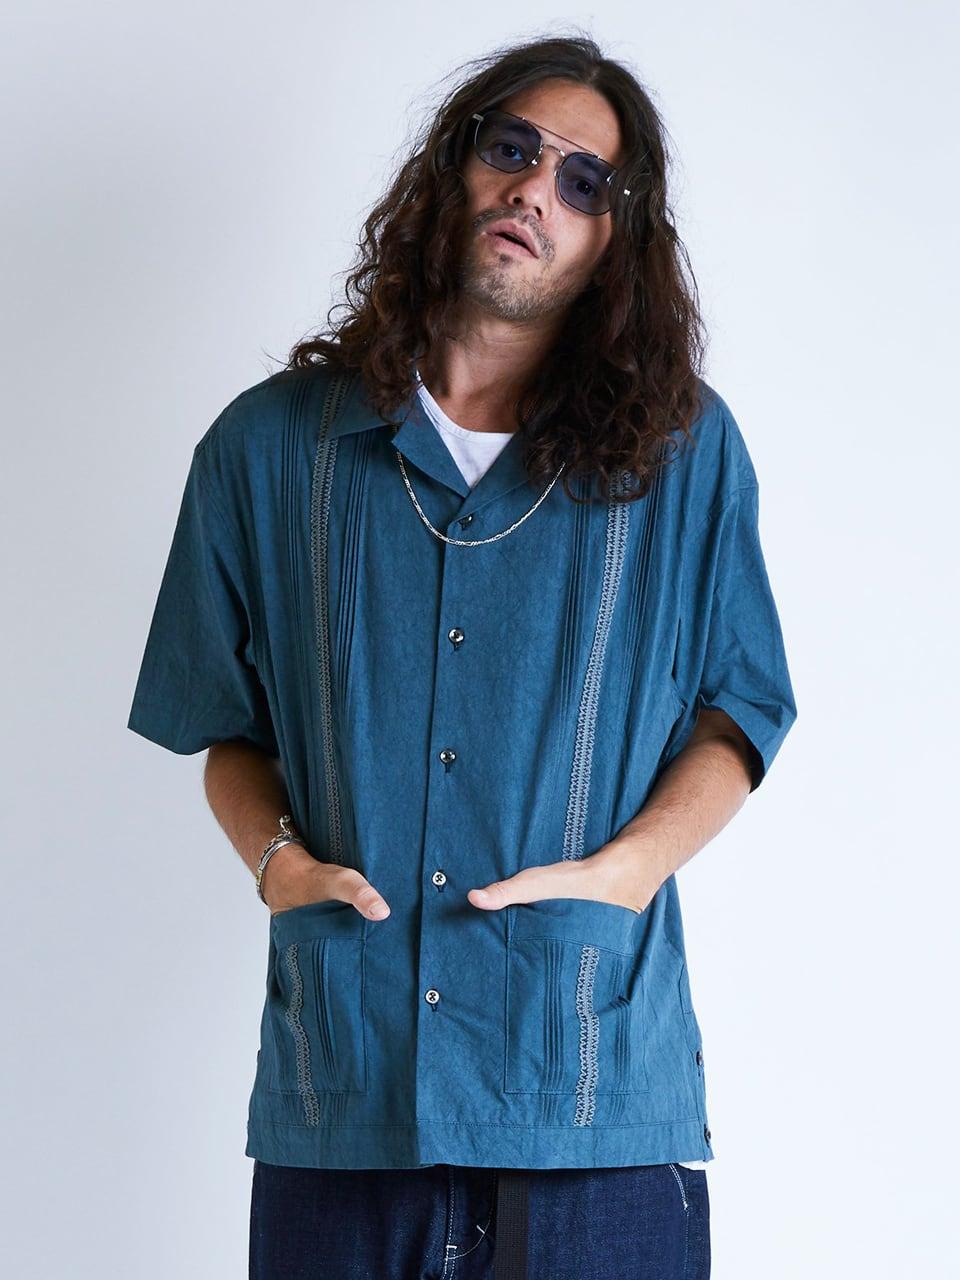 EGO TRIPPING (エゴトリッピング) FADE CUBA SHIRTS フェイドキューバシャツ / SAX 613817-80